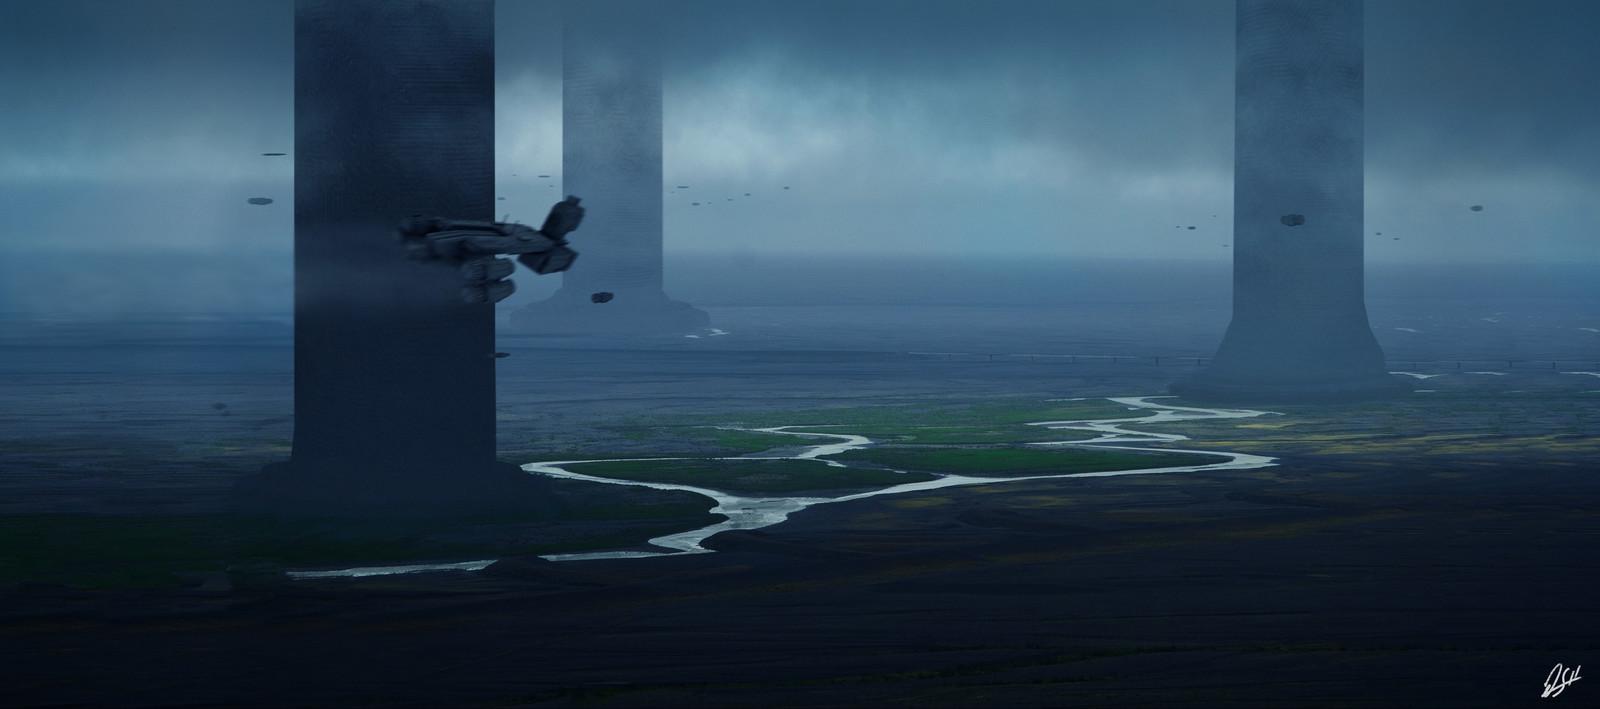 Sci-Fi Pillars